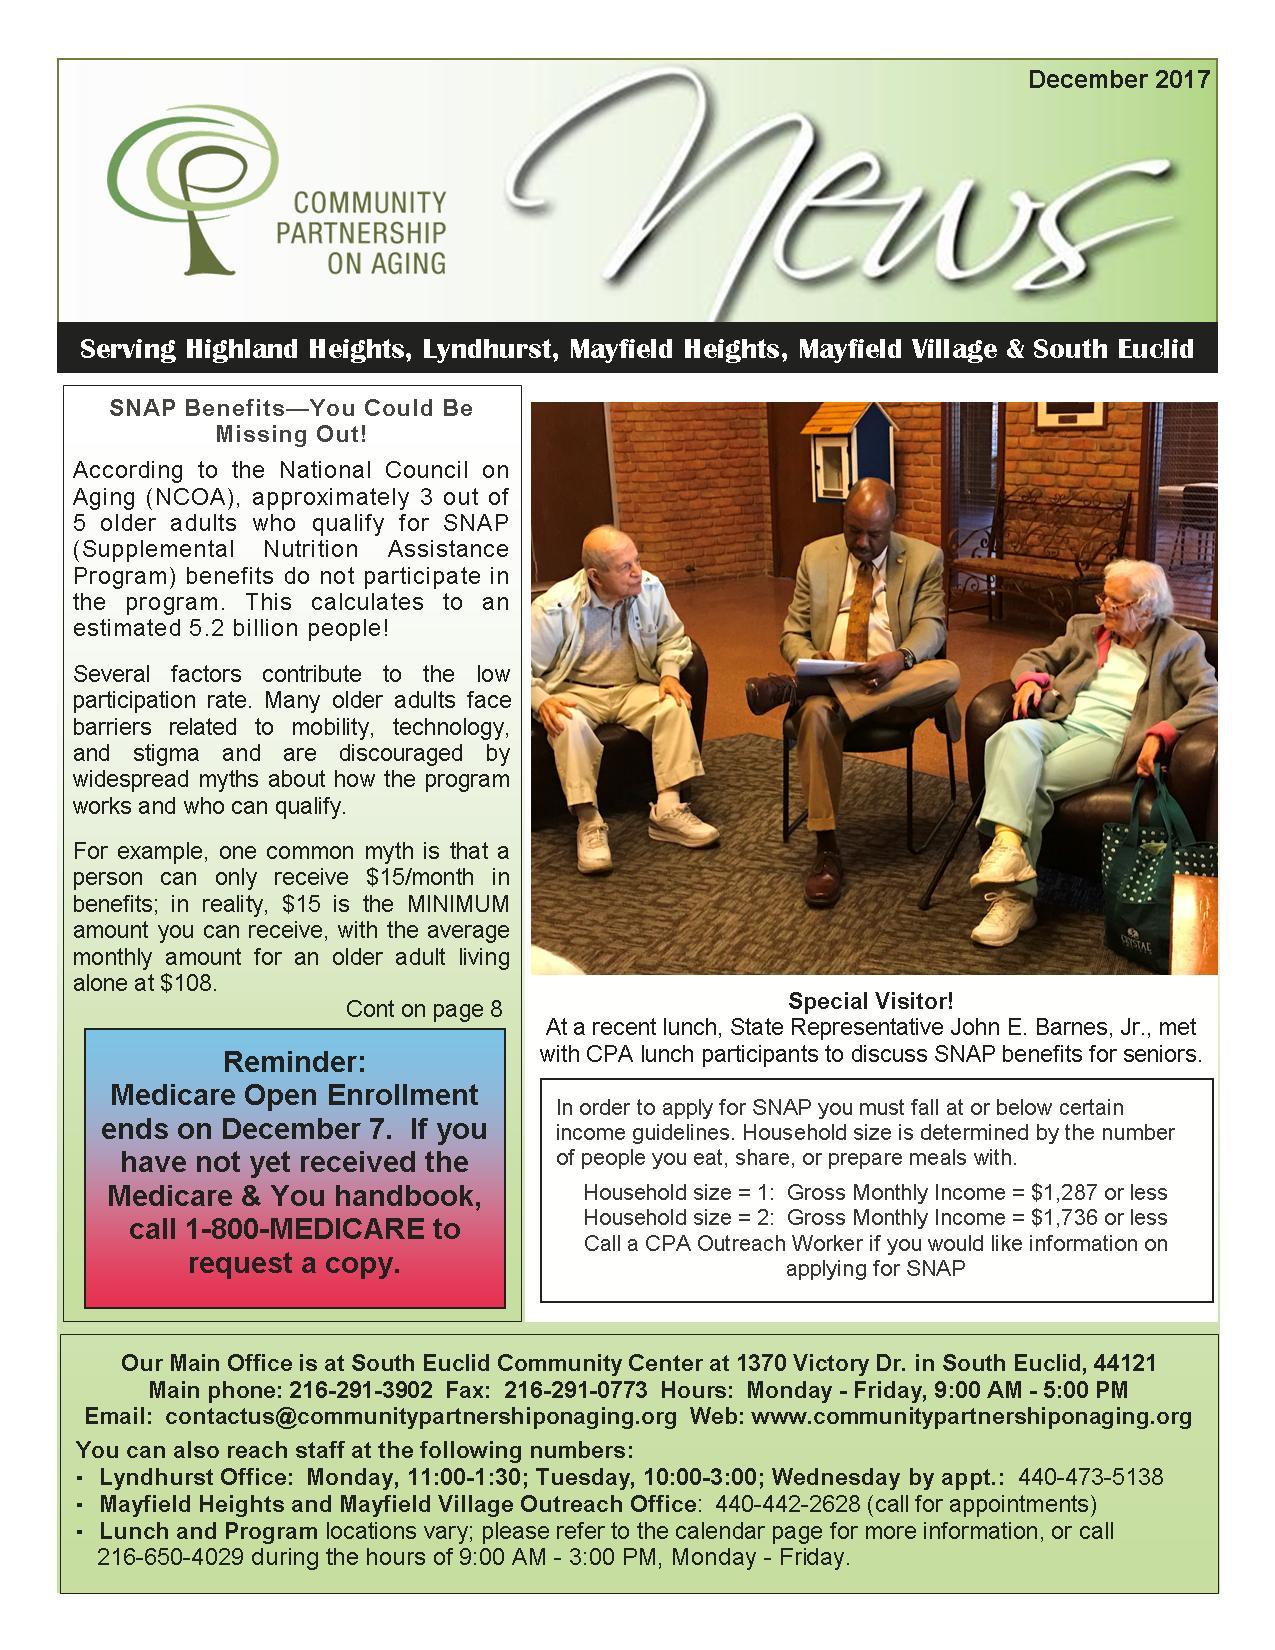 December 2017 CPA Newsletter